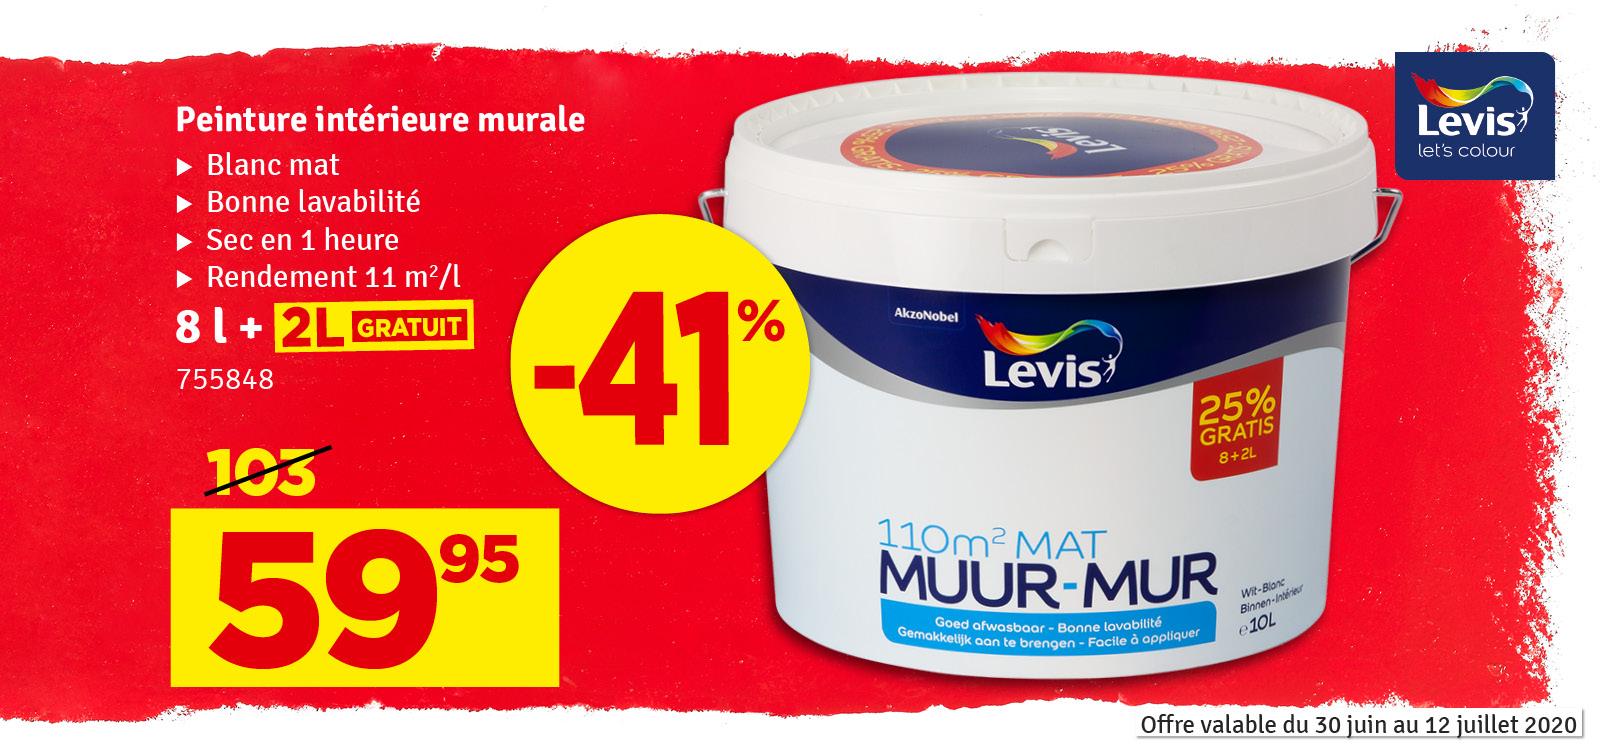 Promo - Peinture mur blanc mat Promopack 8 + 2 L LEVIS